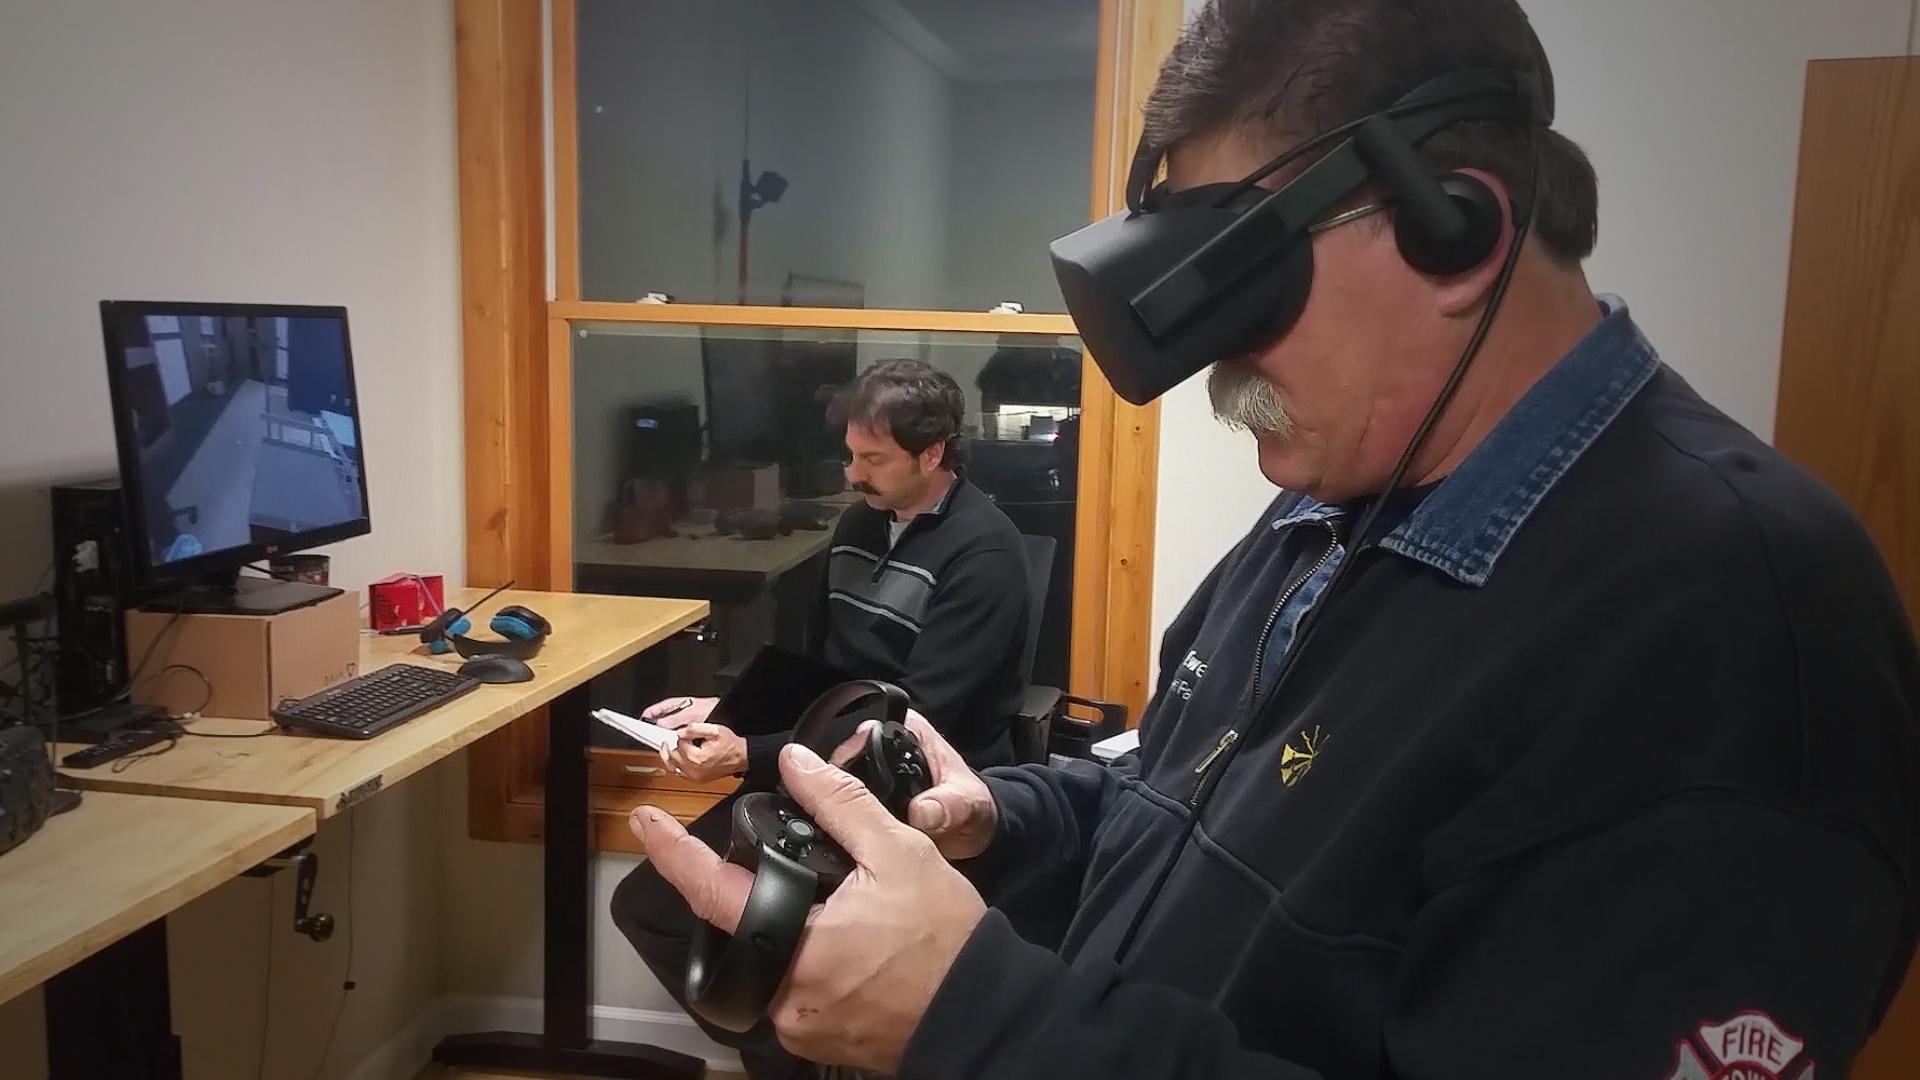 MRI hospital simulation in VR